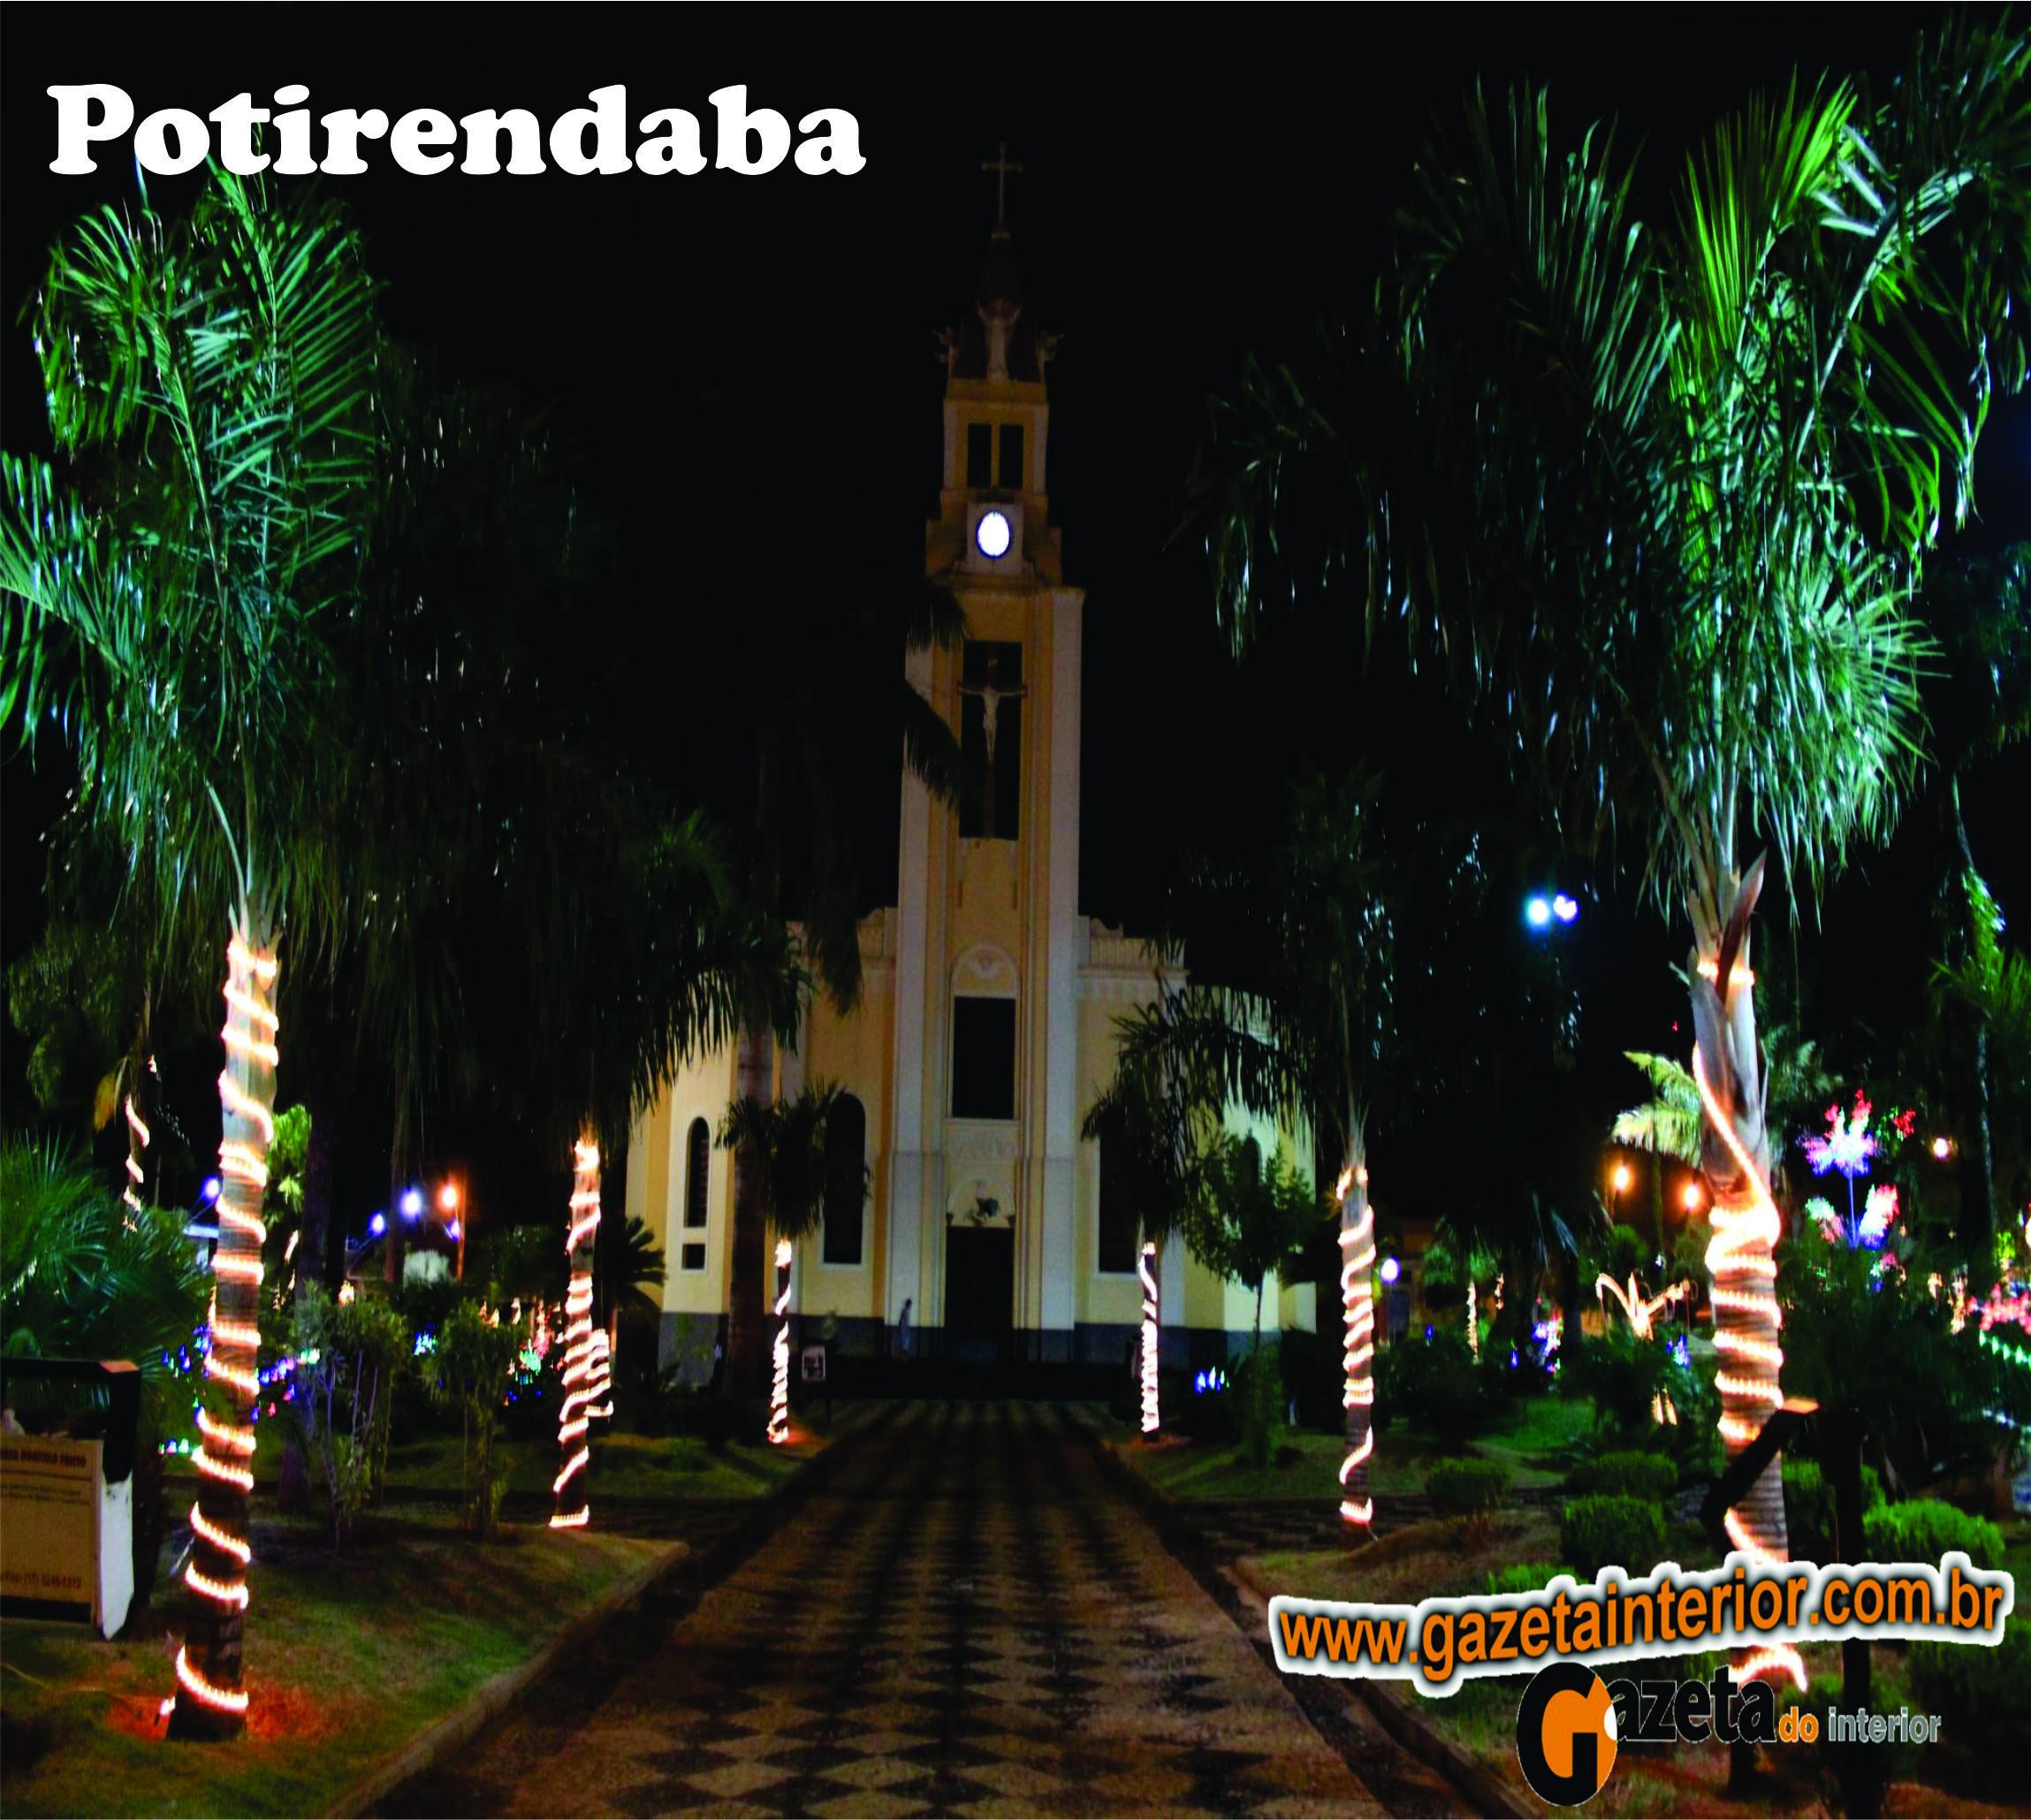 POTIRENDABA